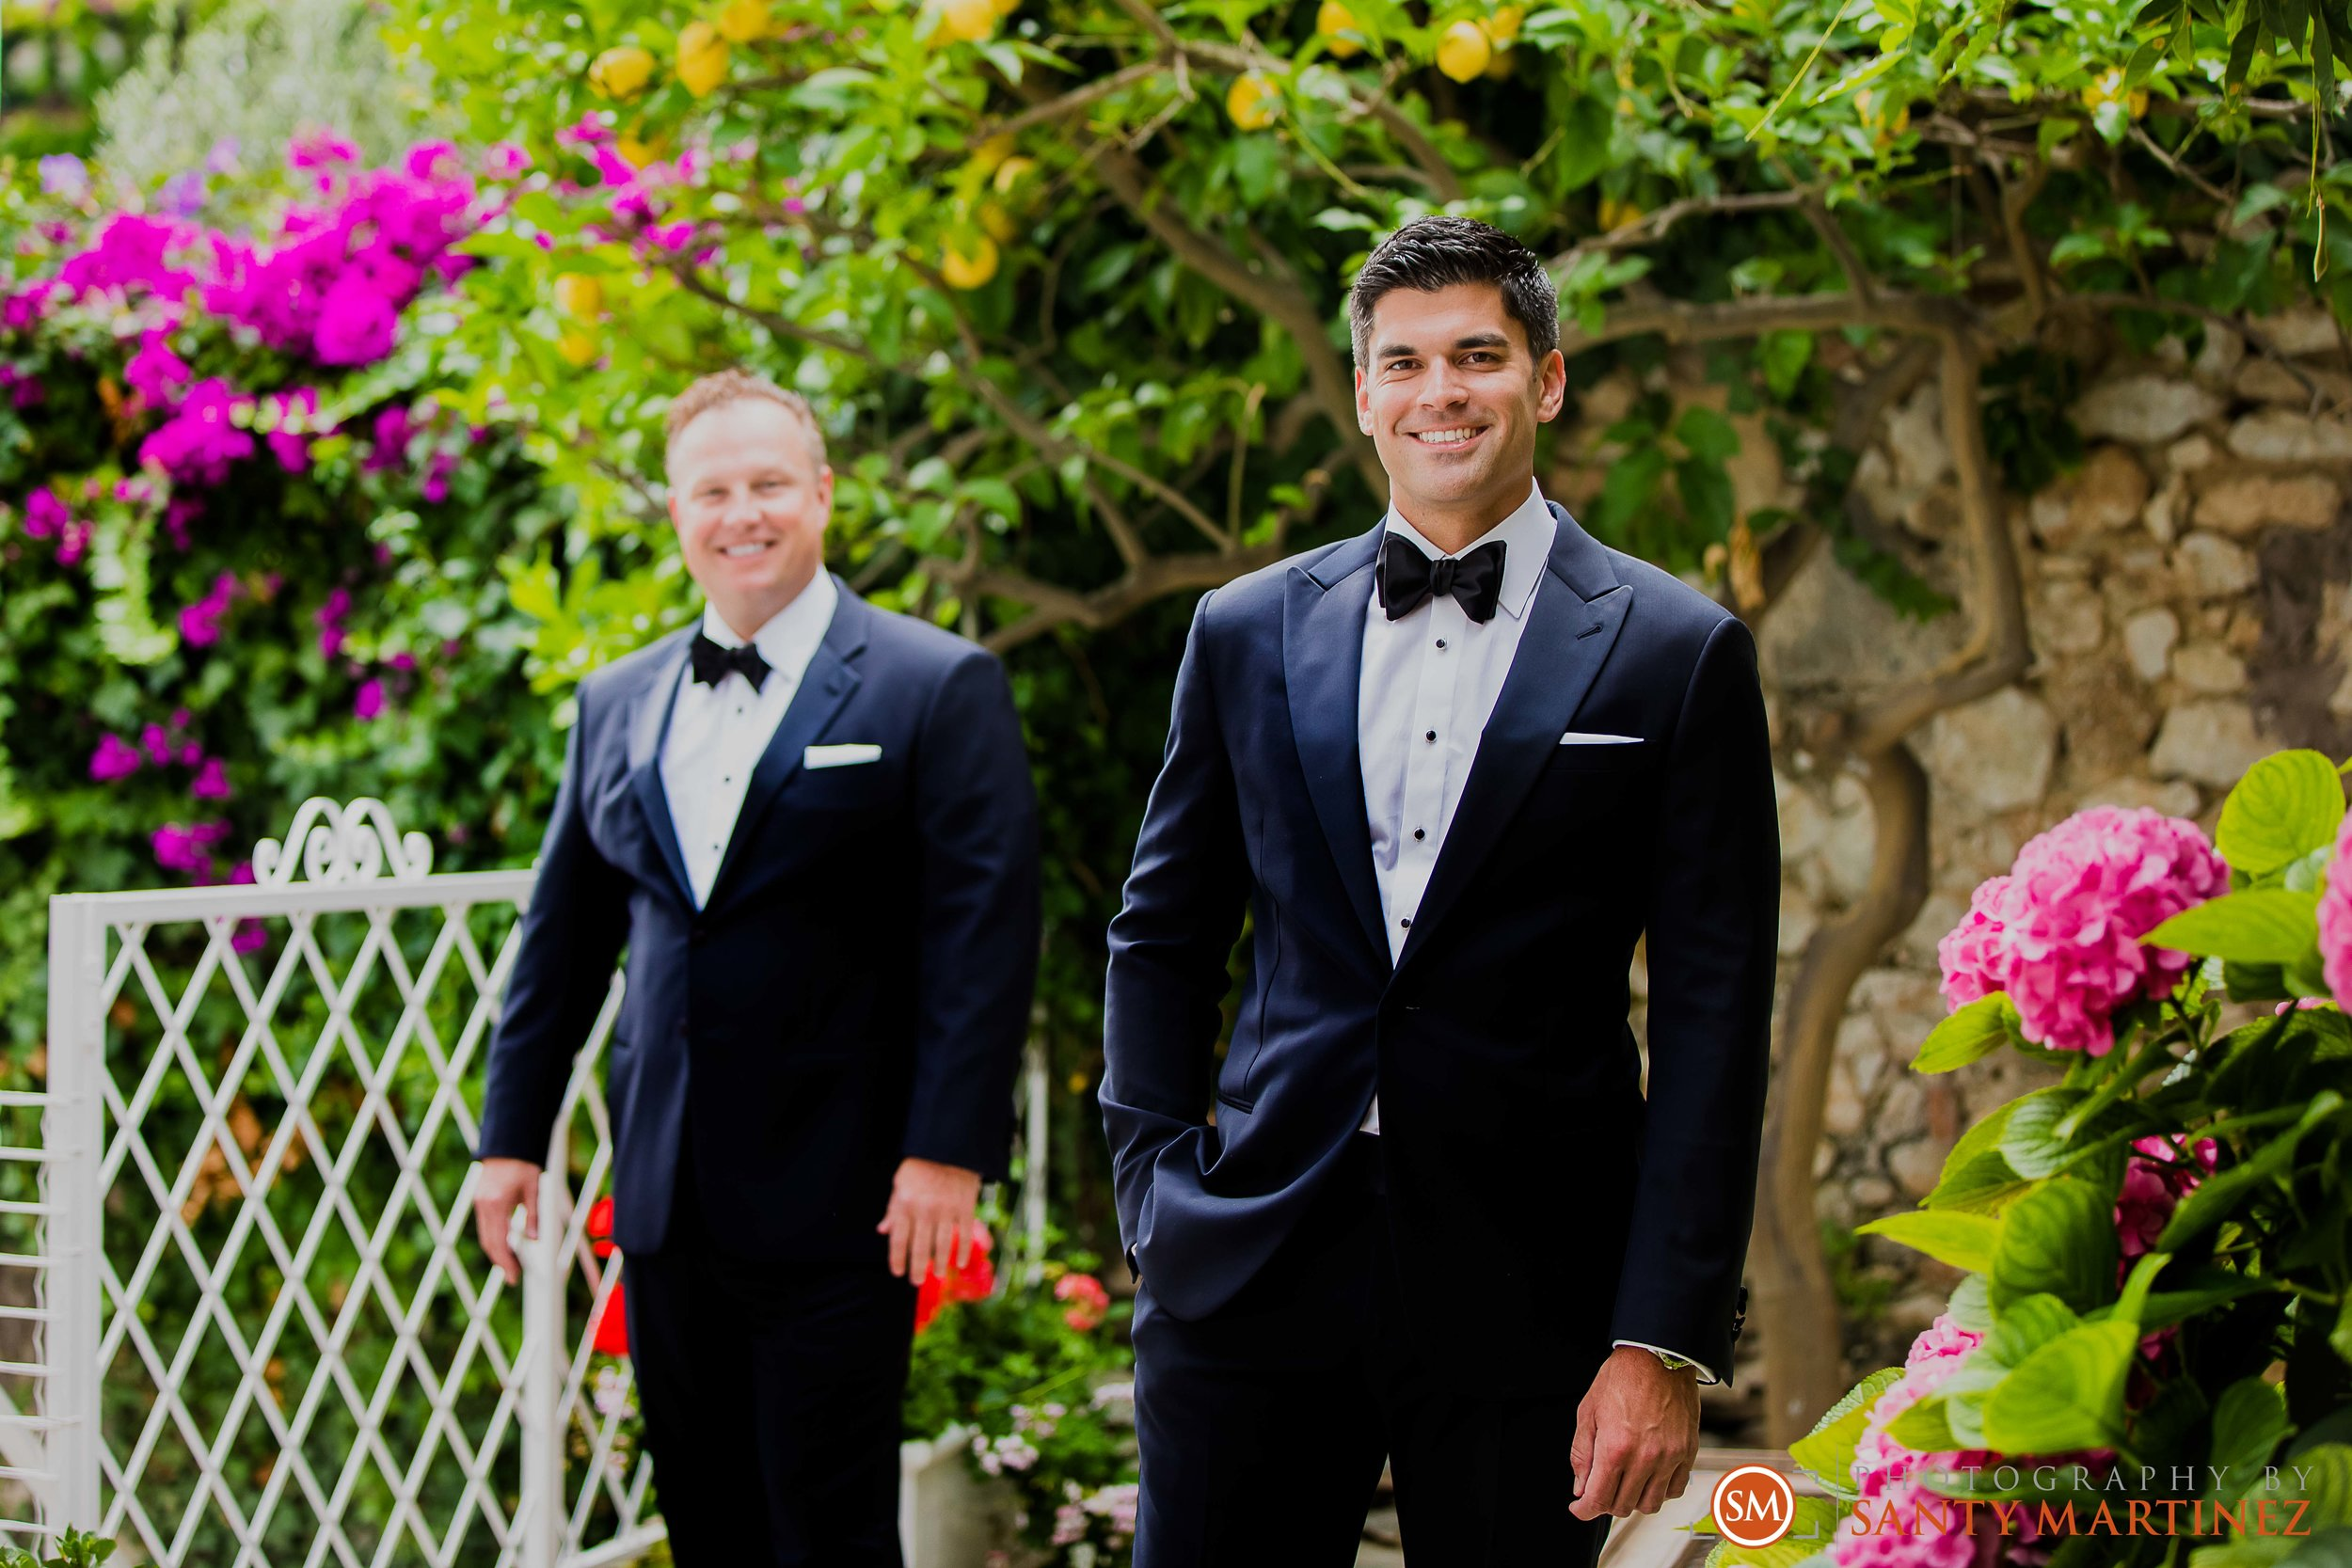 Wedding Capri Italy - Photography by Santy Martinez-14.jpg